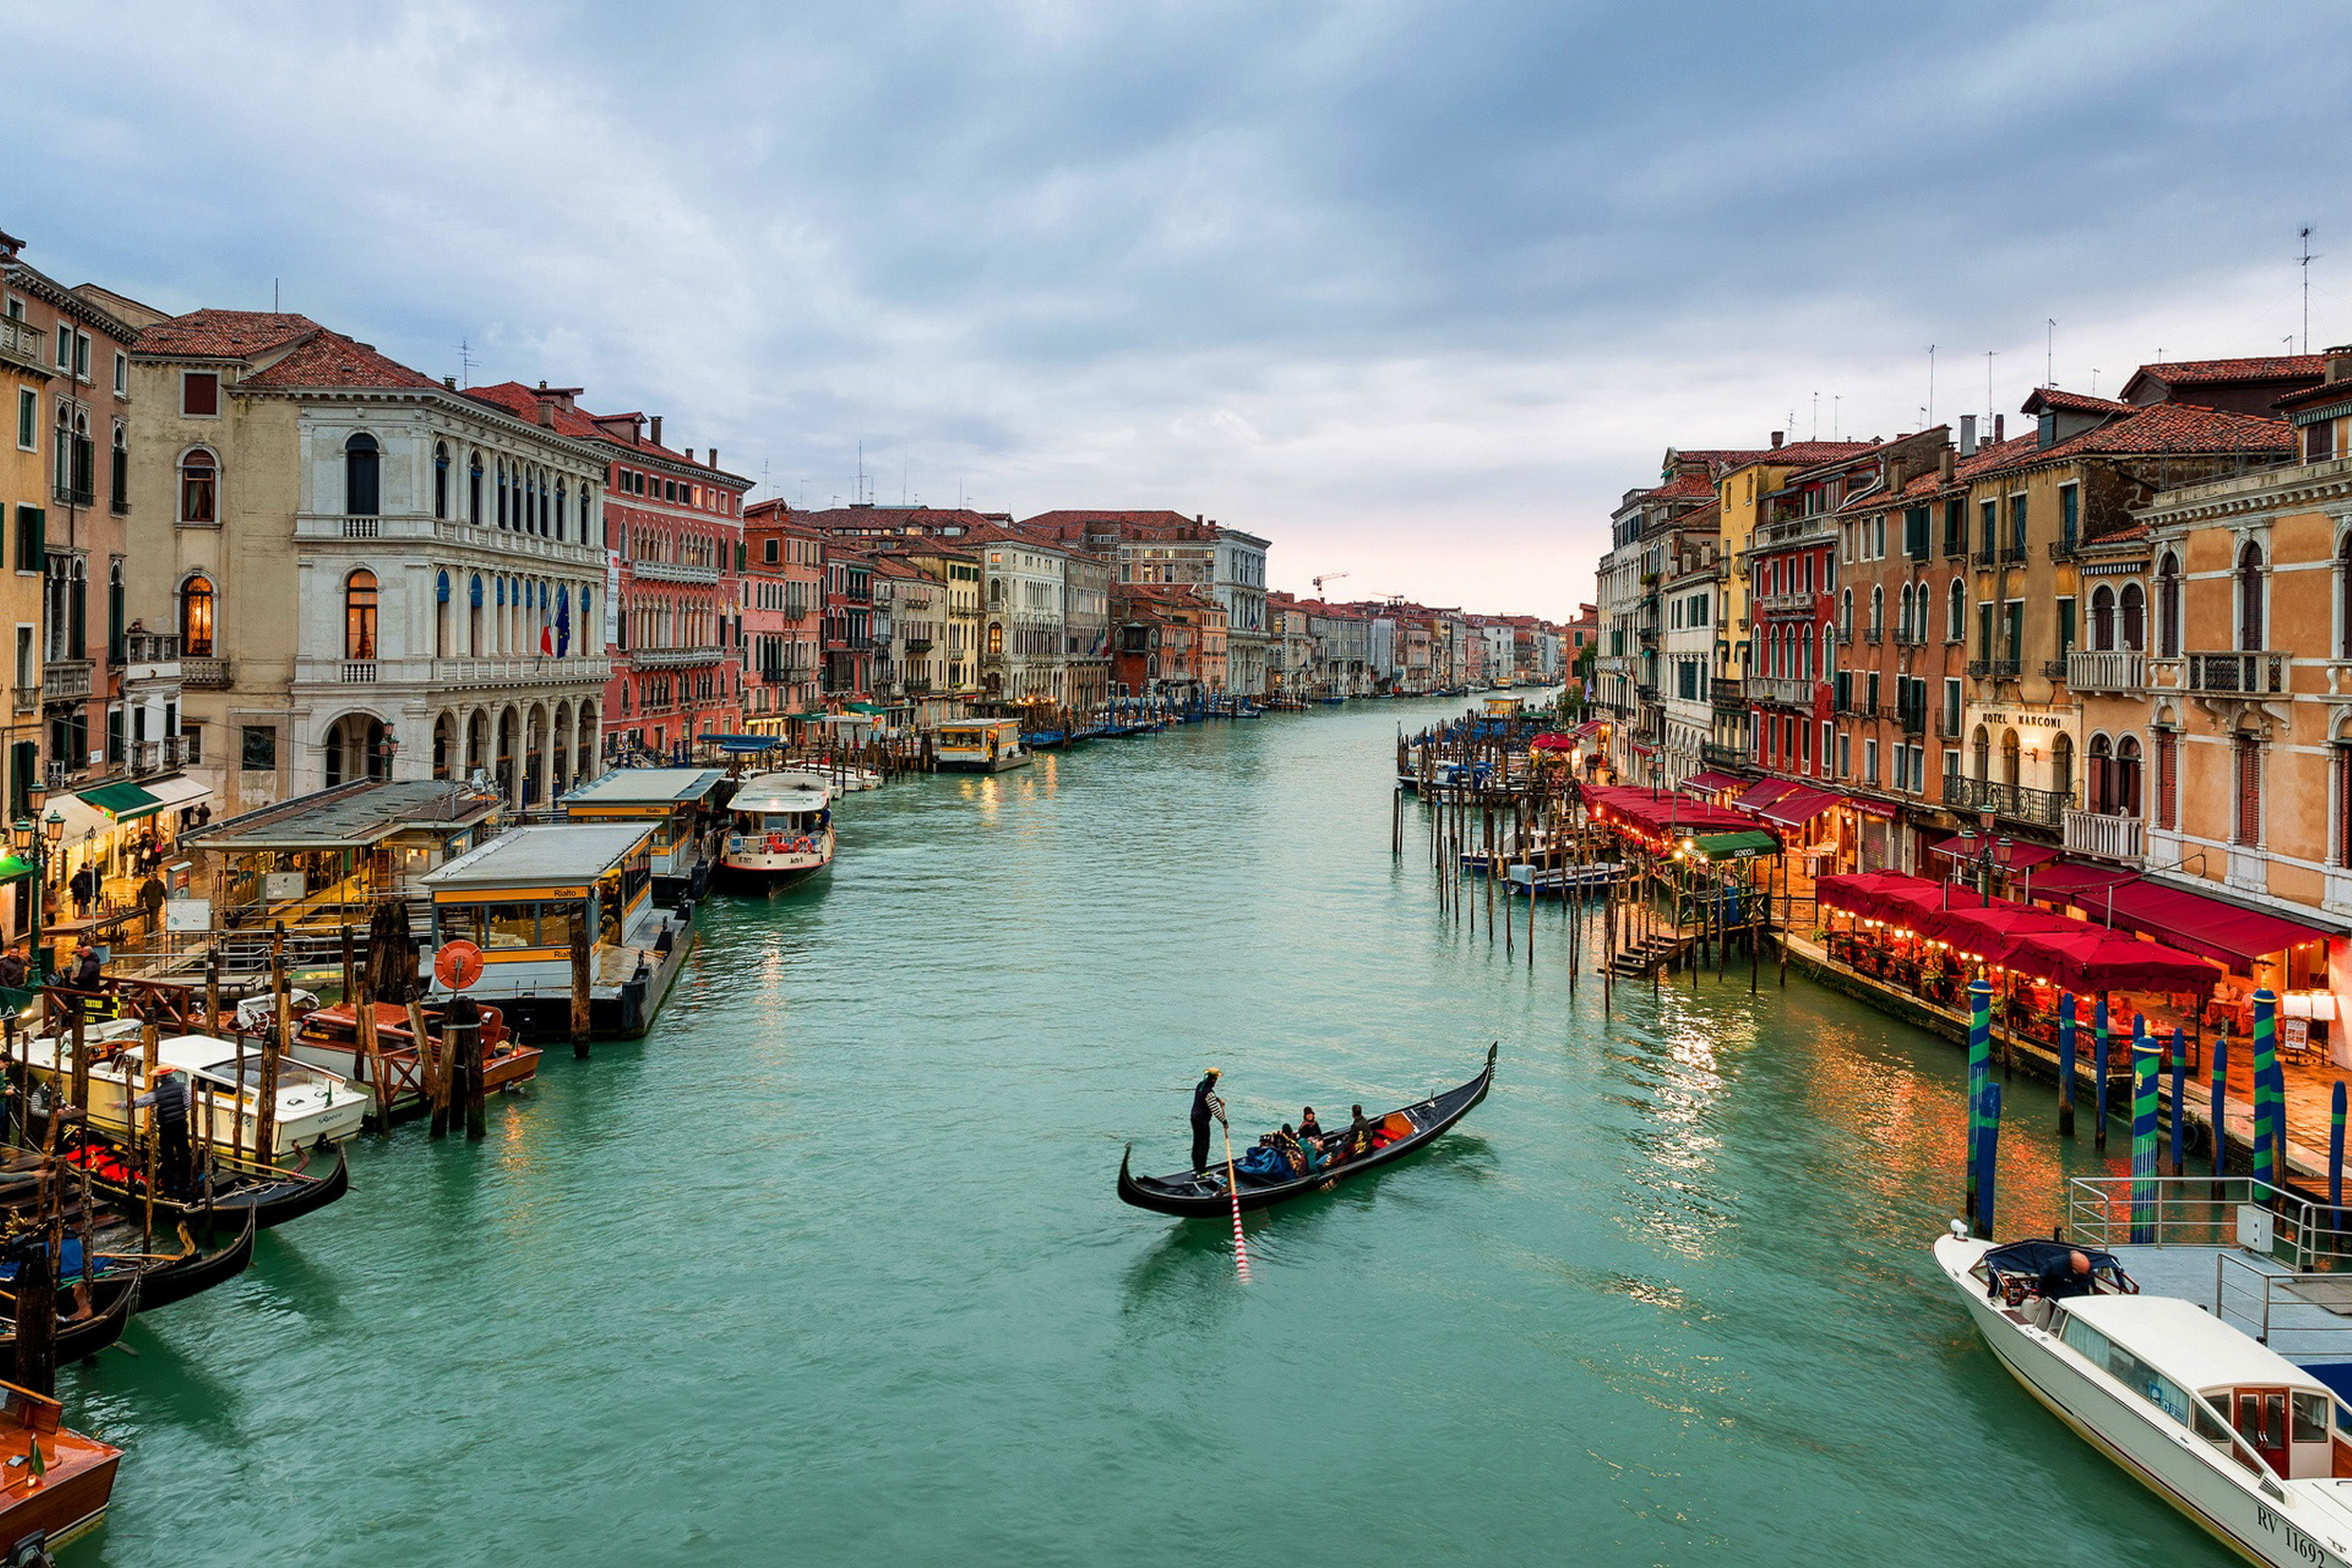 Italien Venezia Canal Grande boote häuser sea sky wohnzimmer decor ...